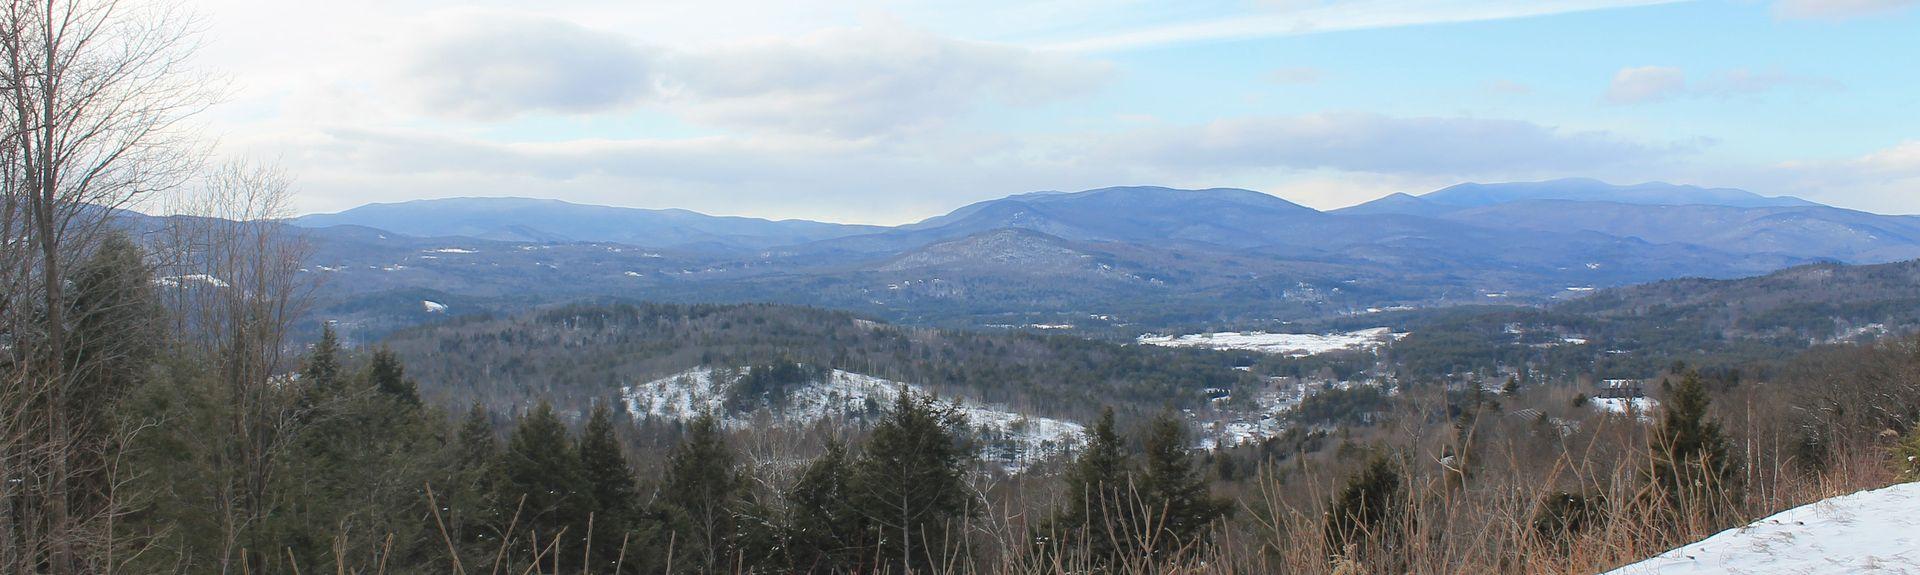 Waterville Valley Resort, Thornton, New Hampshire, USA